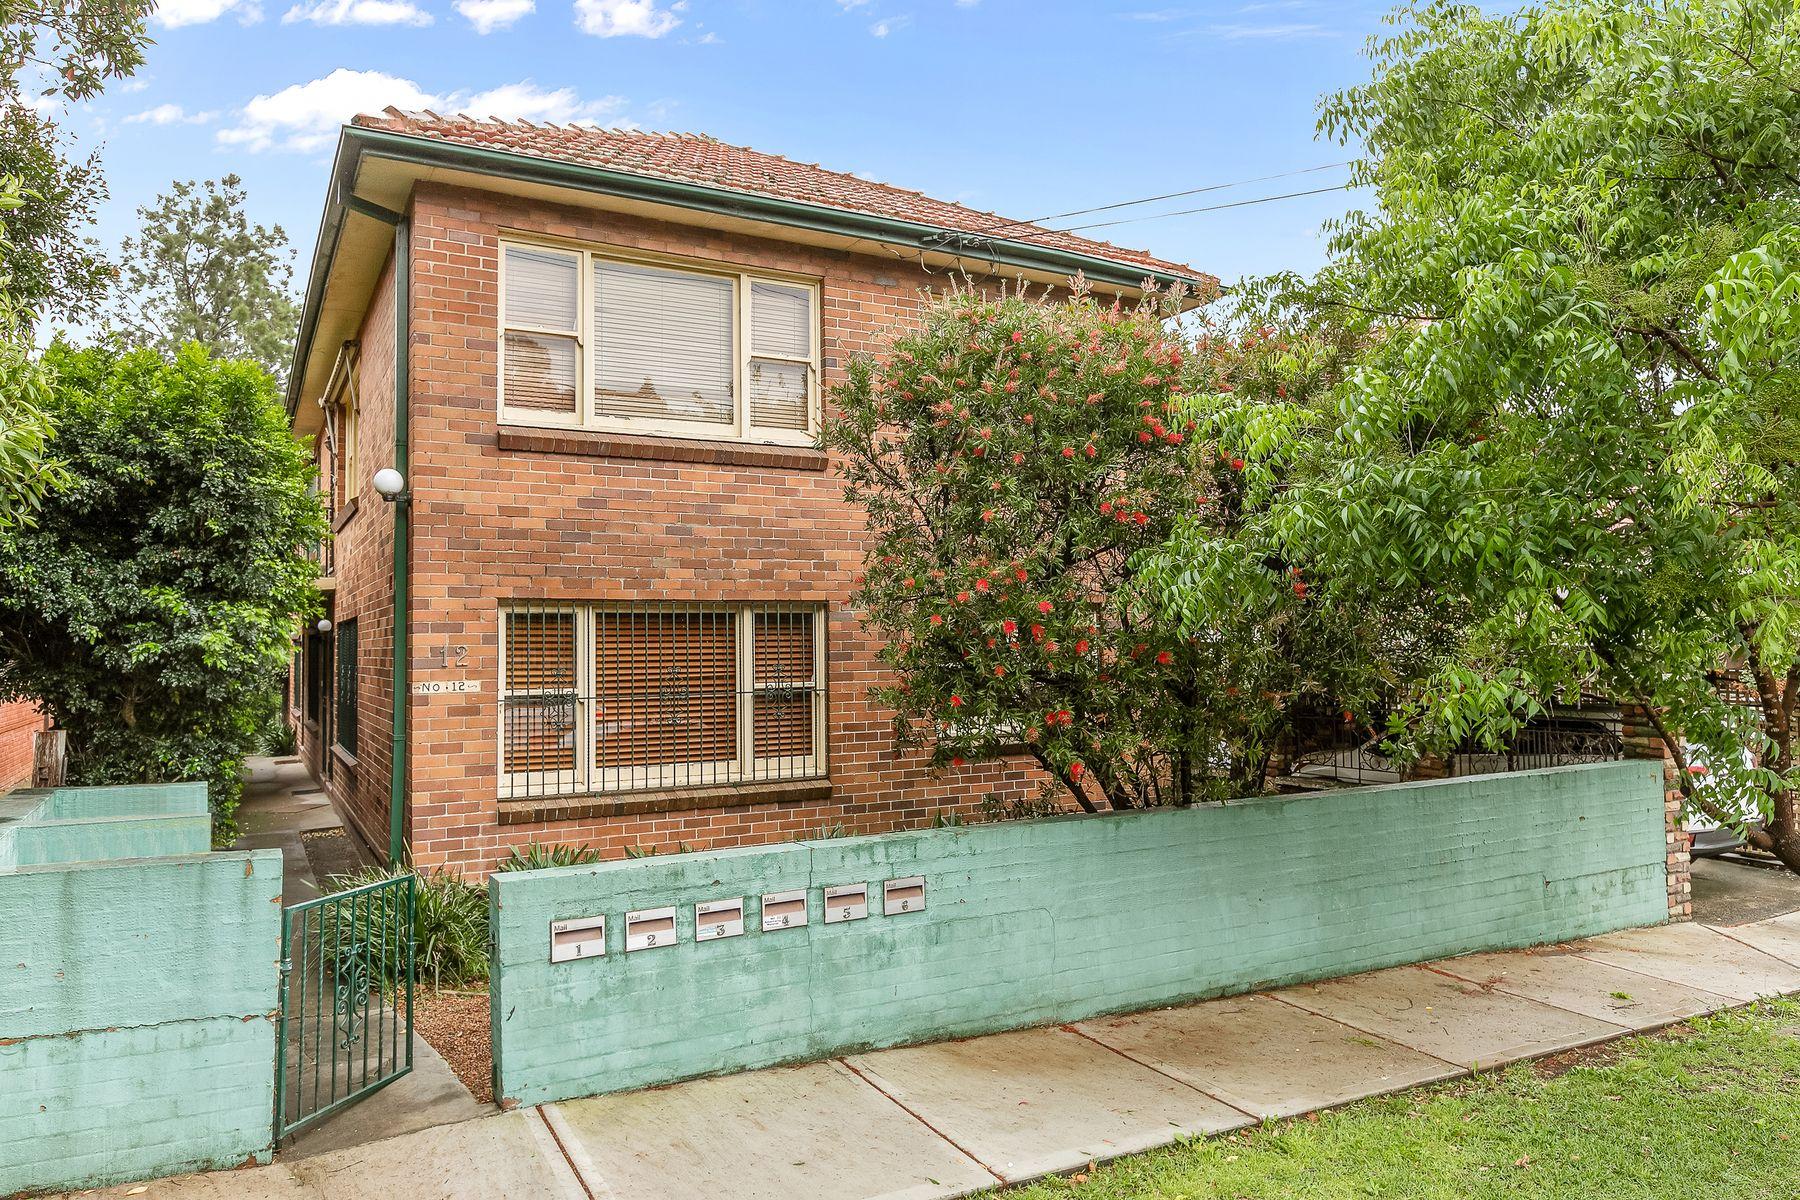 6/12 George Street, Marrickville, NSW 2204